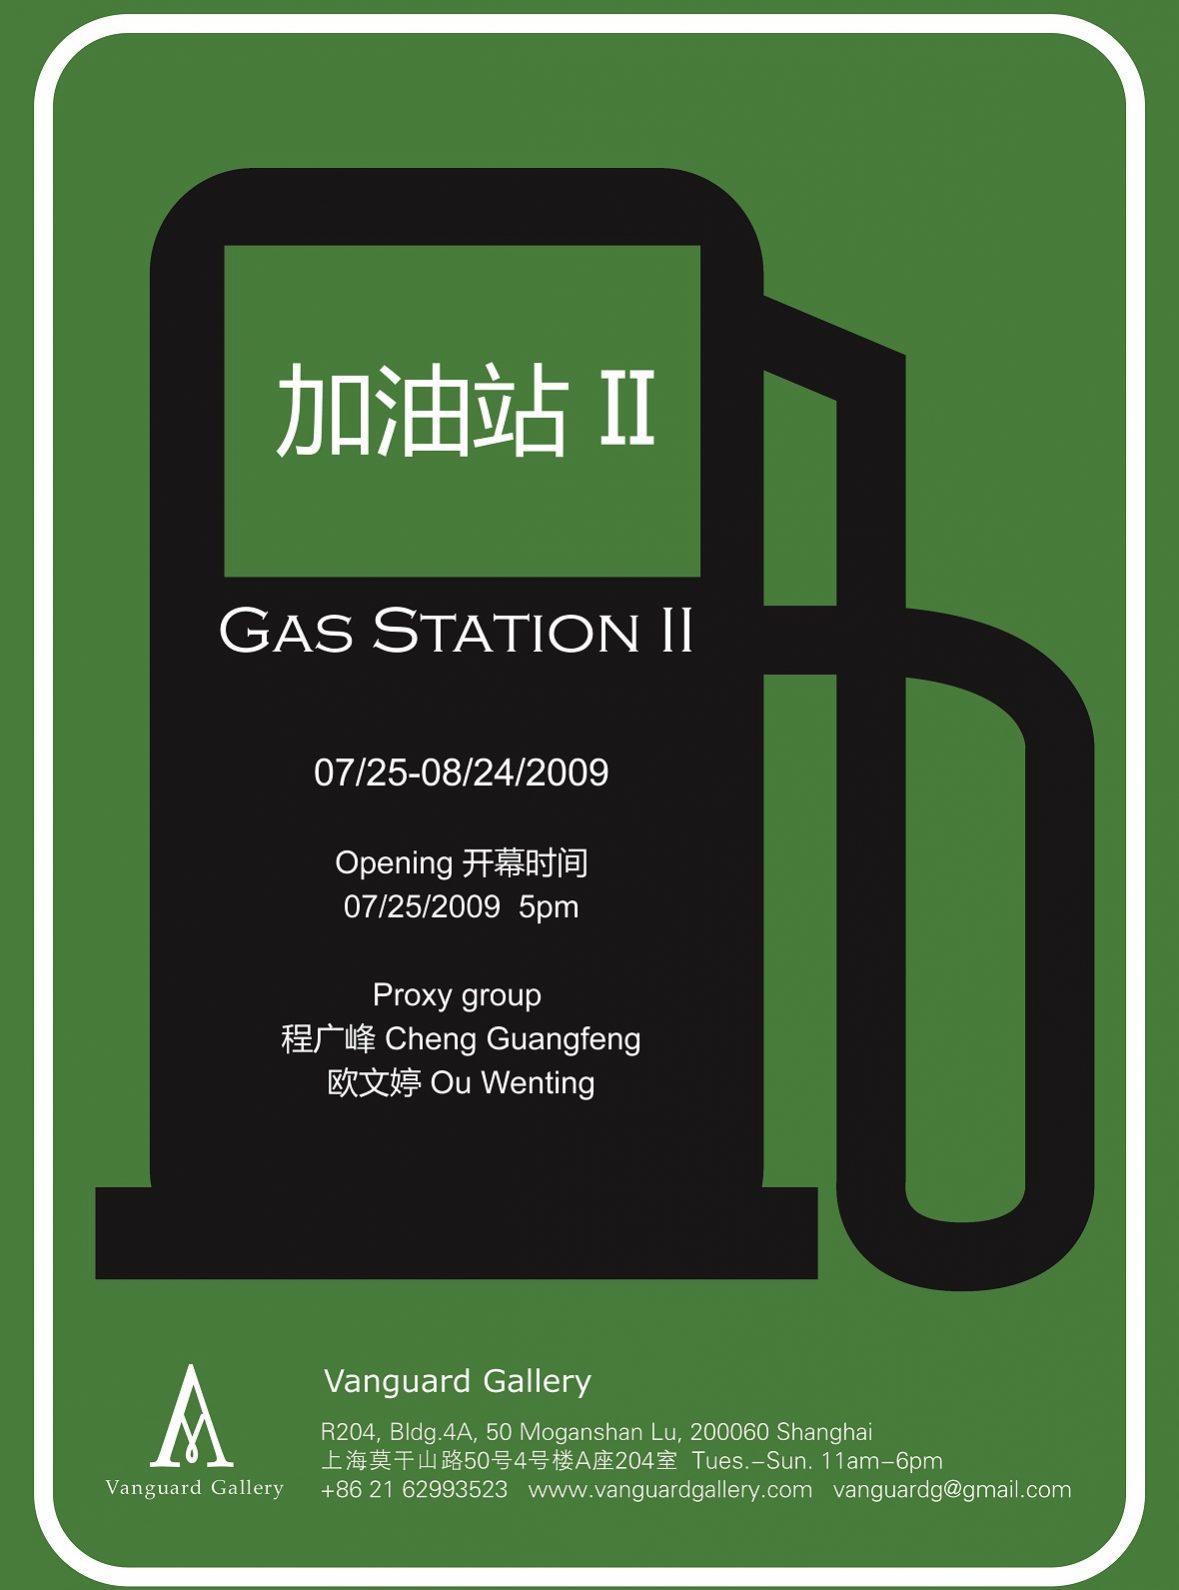 Gas Station II